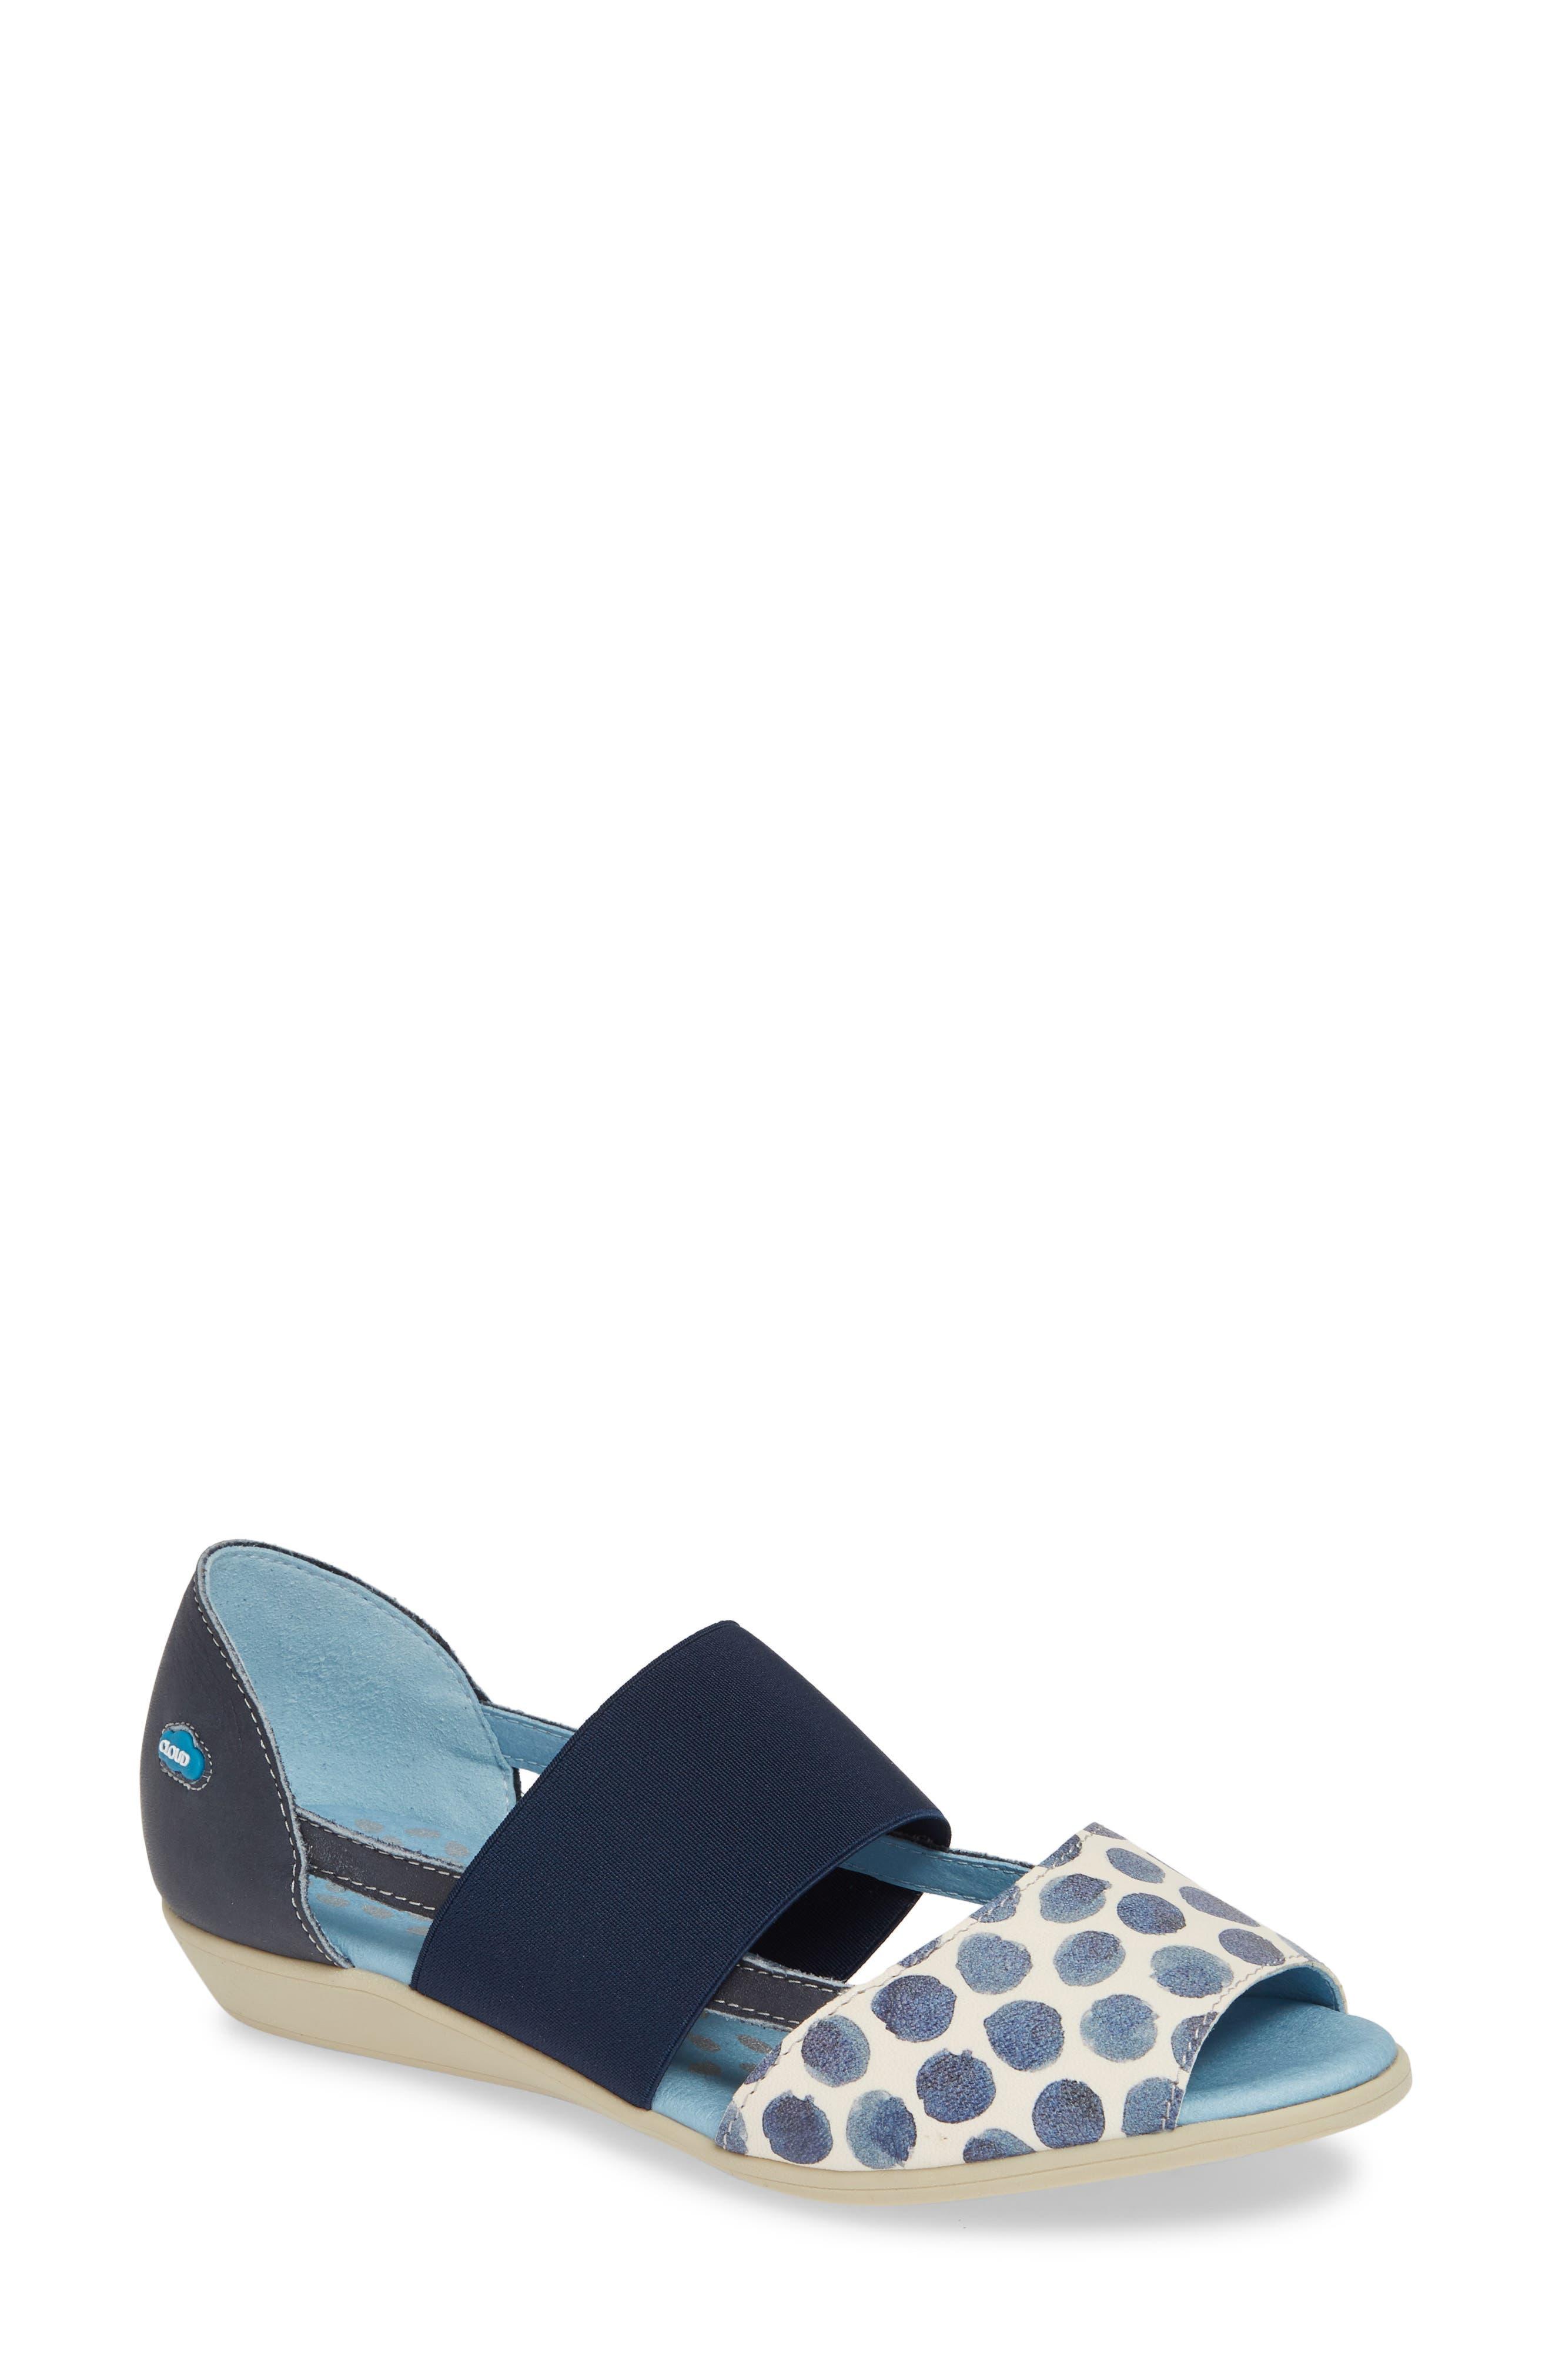 CLOUD,                             'Canary' Skimmer Sandal,                             Main thumbnail 1, color,                             TUPAI BLUE LEATHER